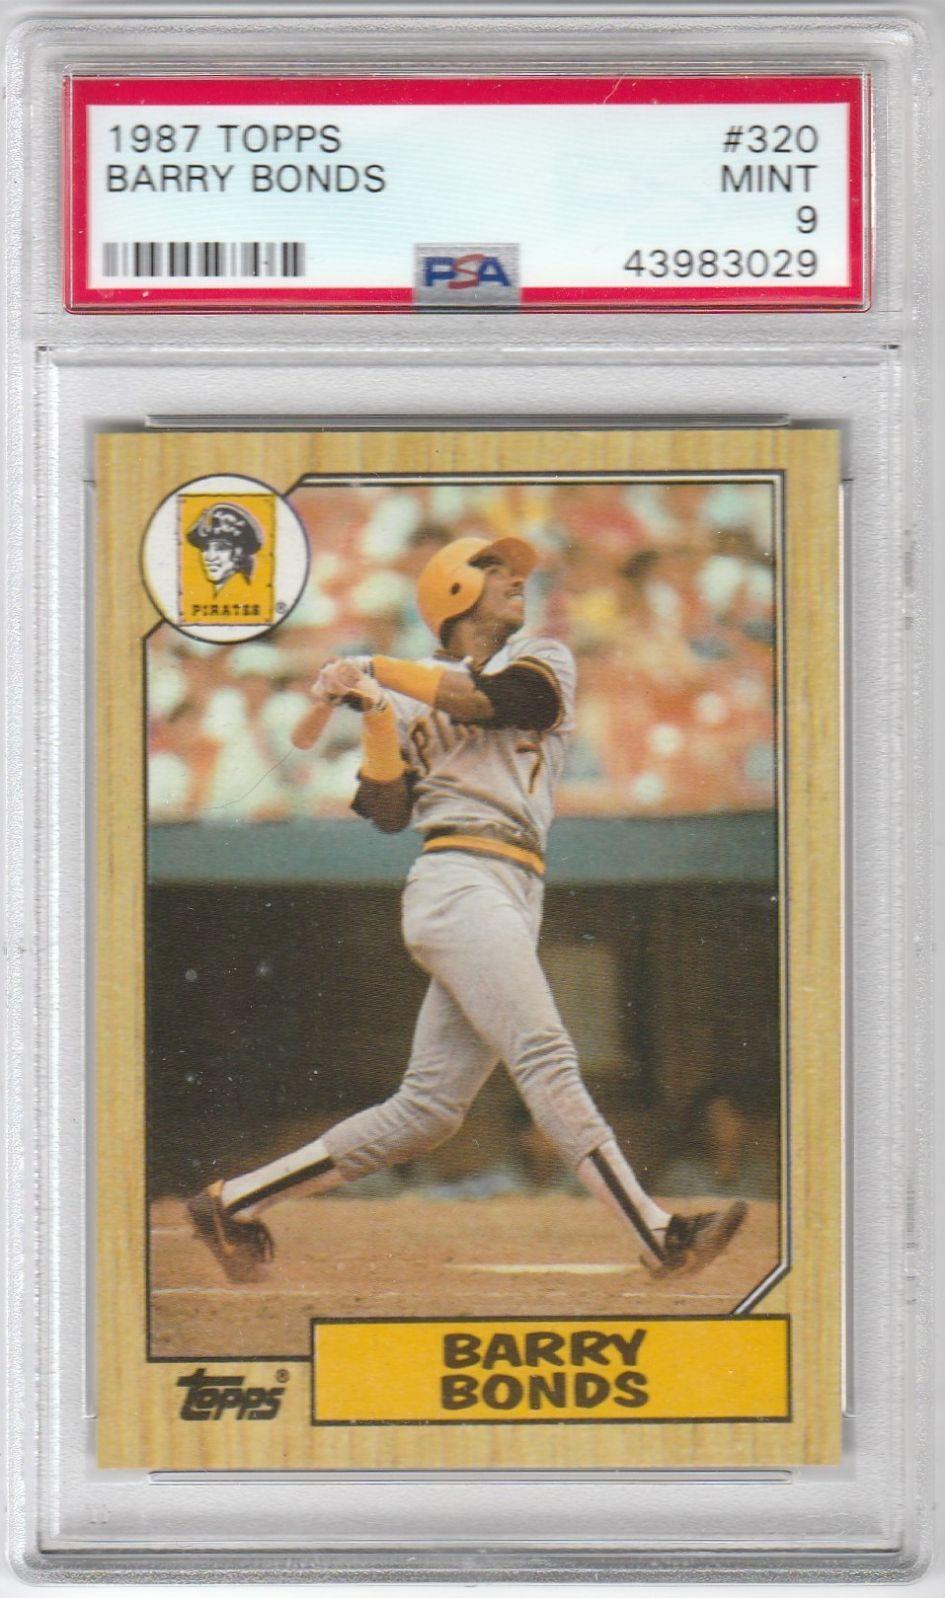 Psa 9 Barry Bonds Rookie 1987 Topps Mercari Barry Bonds Baseball Cards Baseball Cards For Sale